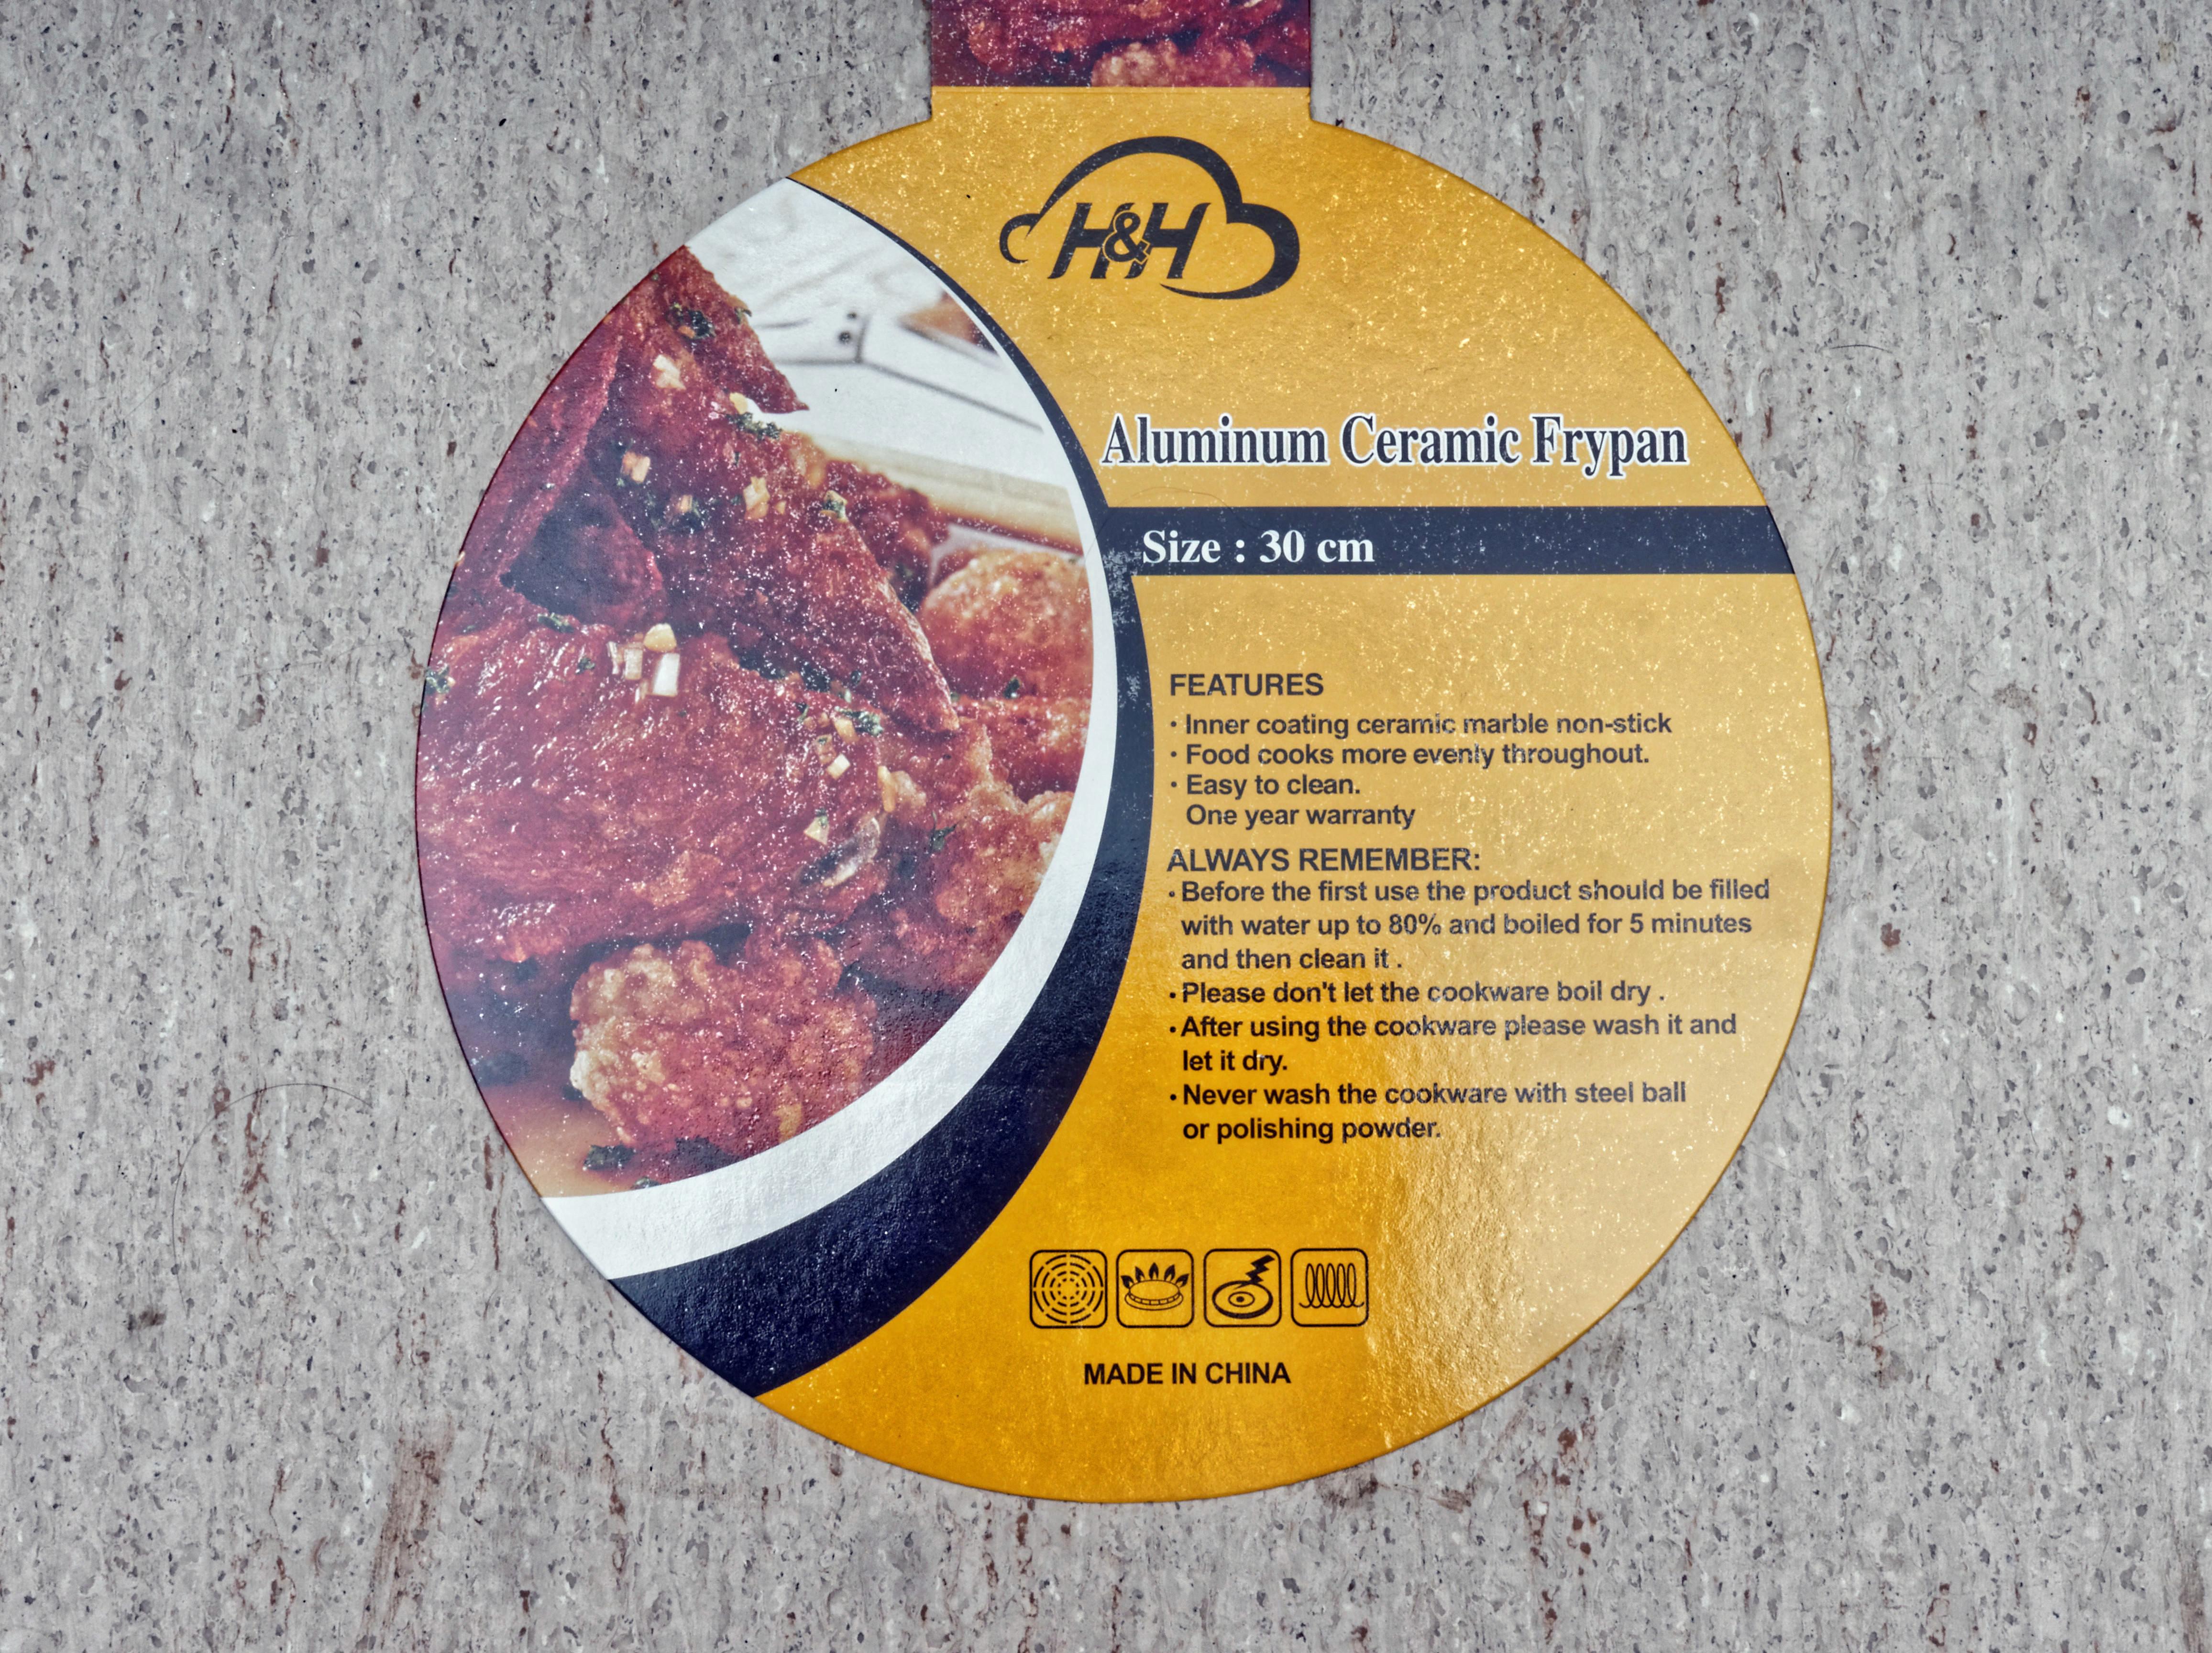 Frying-pan-description-1.jpeg